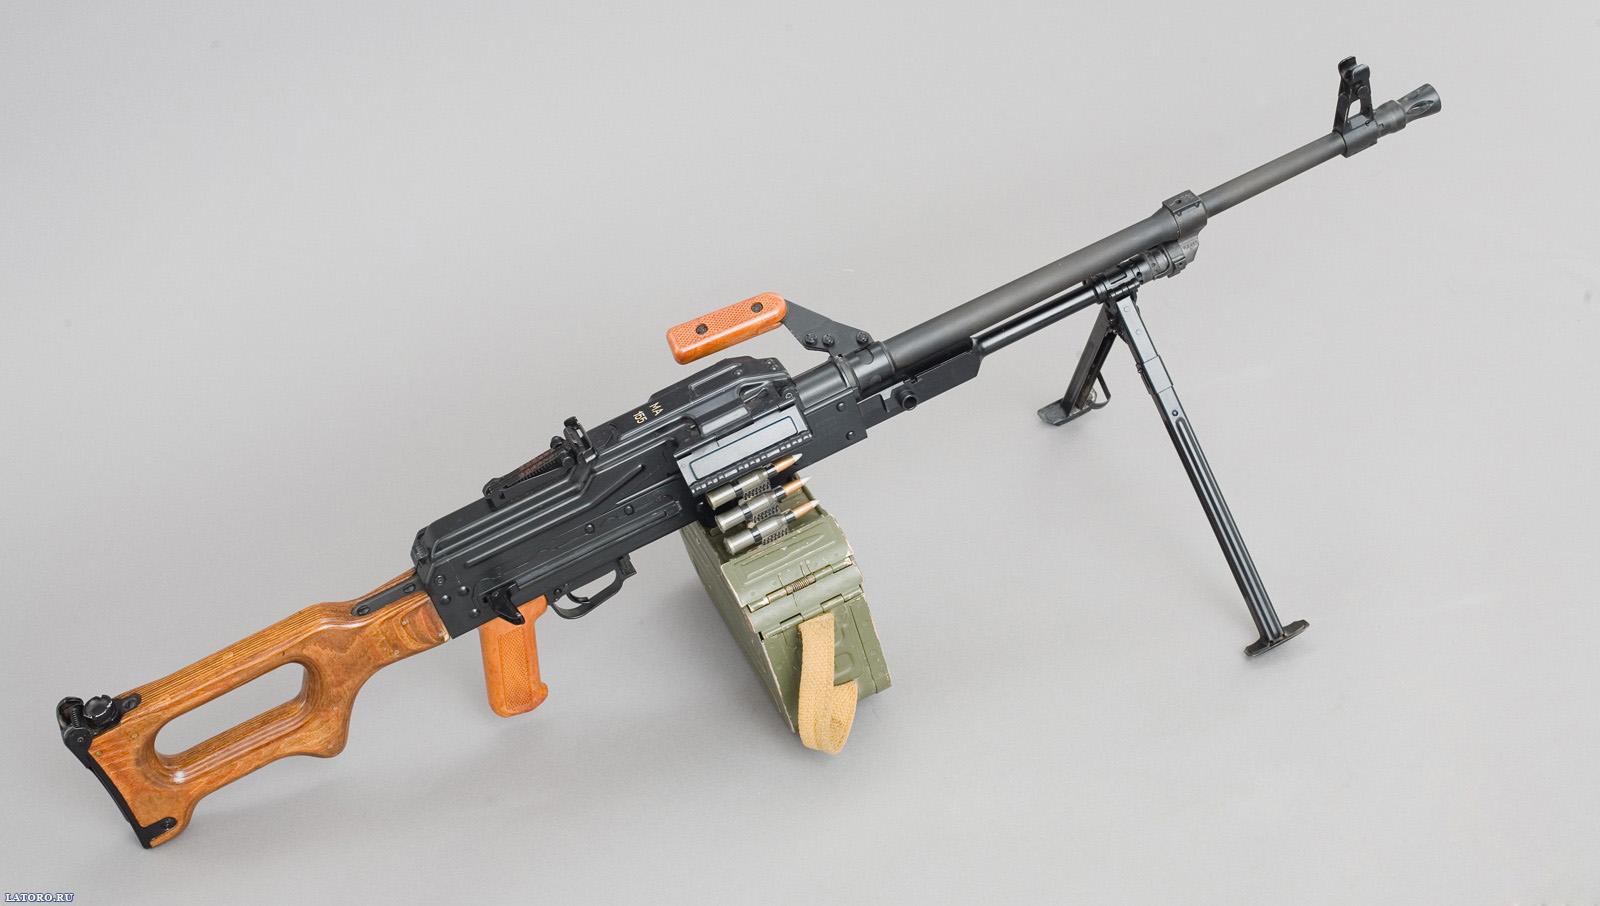 http://4.bp.blogspot.com/-KbQudegdDDQ/Tav2CfnustI/AAAAAAAAC98/TZ52qHOUG3k/s1600/Gun+%25281%2529.jpg